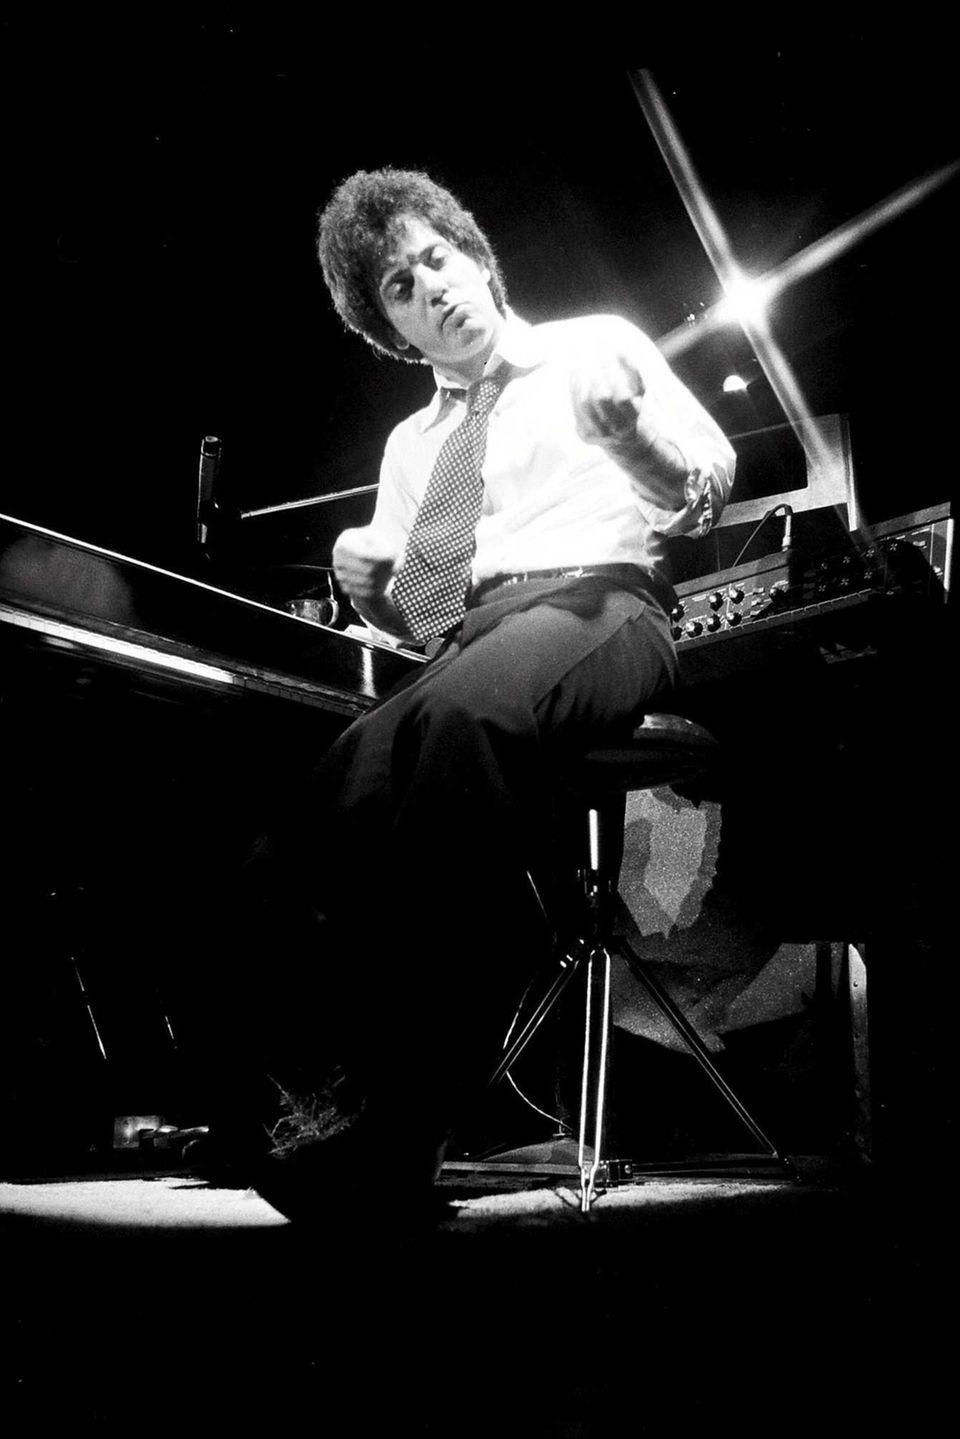 April 2, 1972: Billy Joel plays the Mar